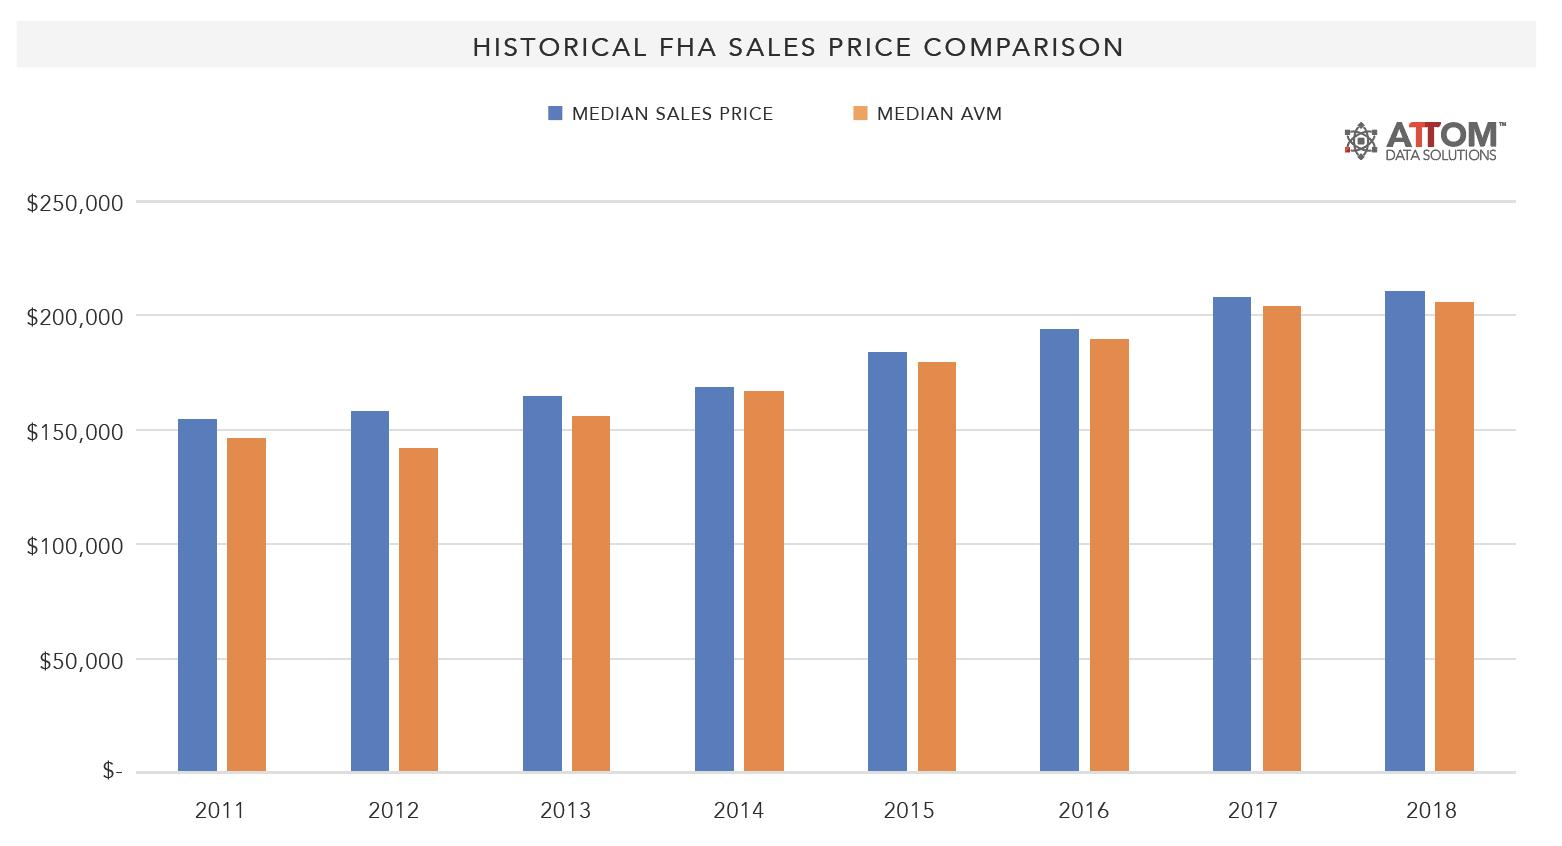 Historical-FHA-Sales-Price-Comparison